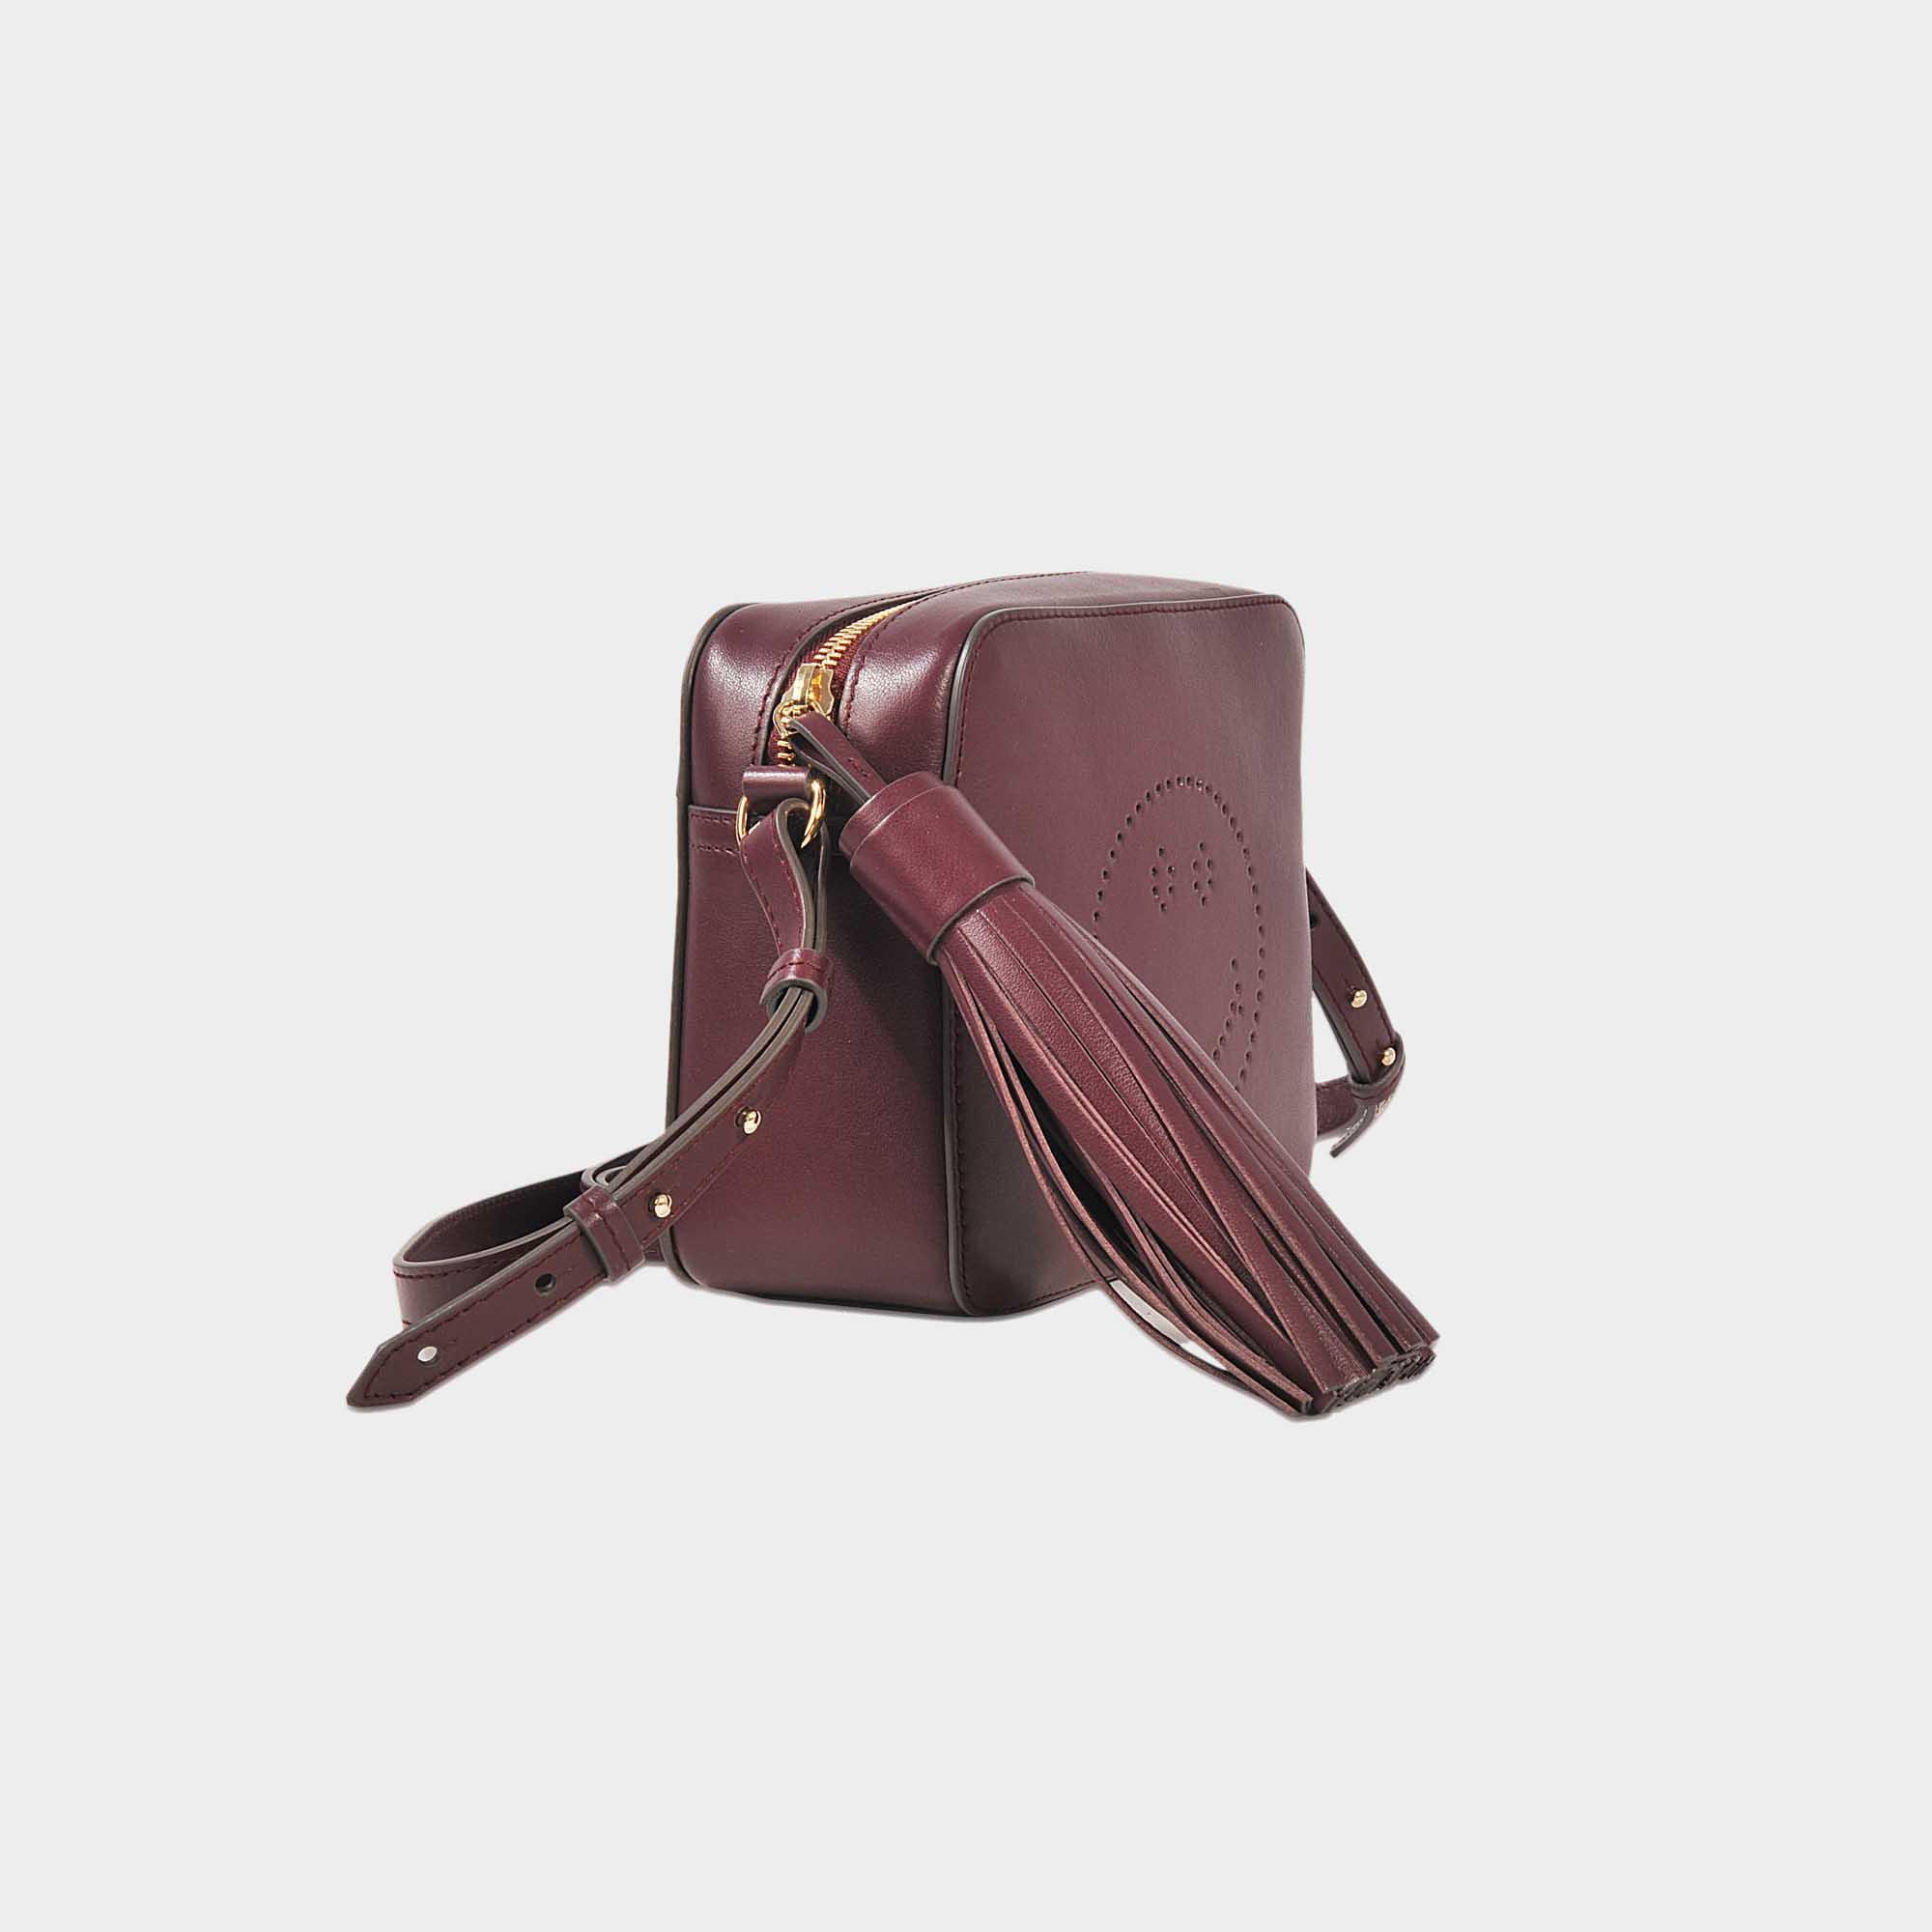 Anya Hindmarch Smiley Crossbody Bag in Purple